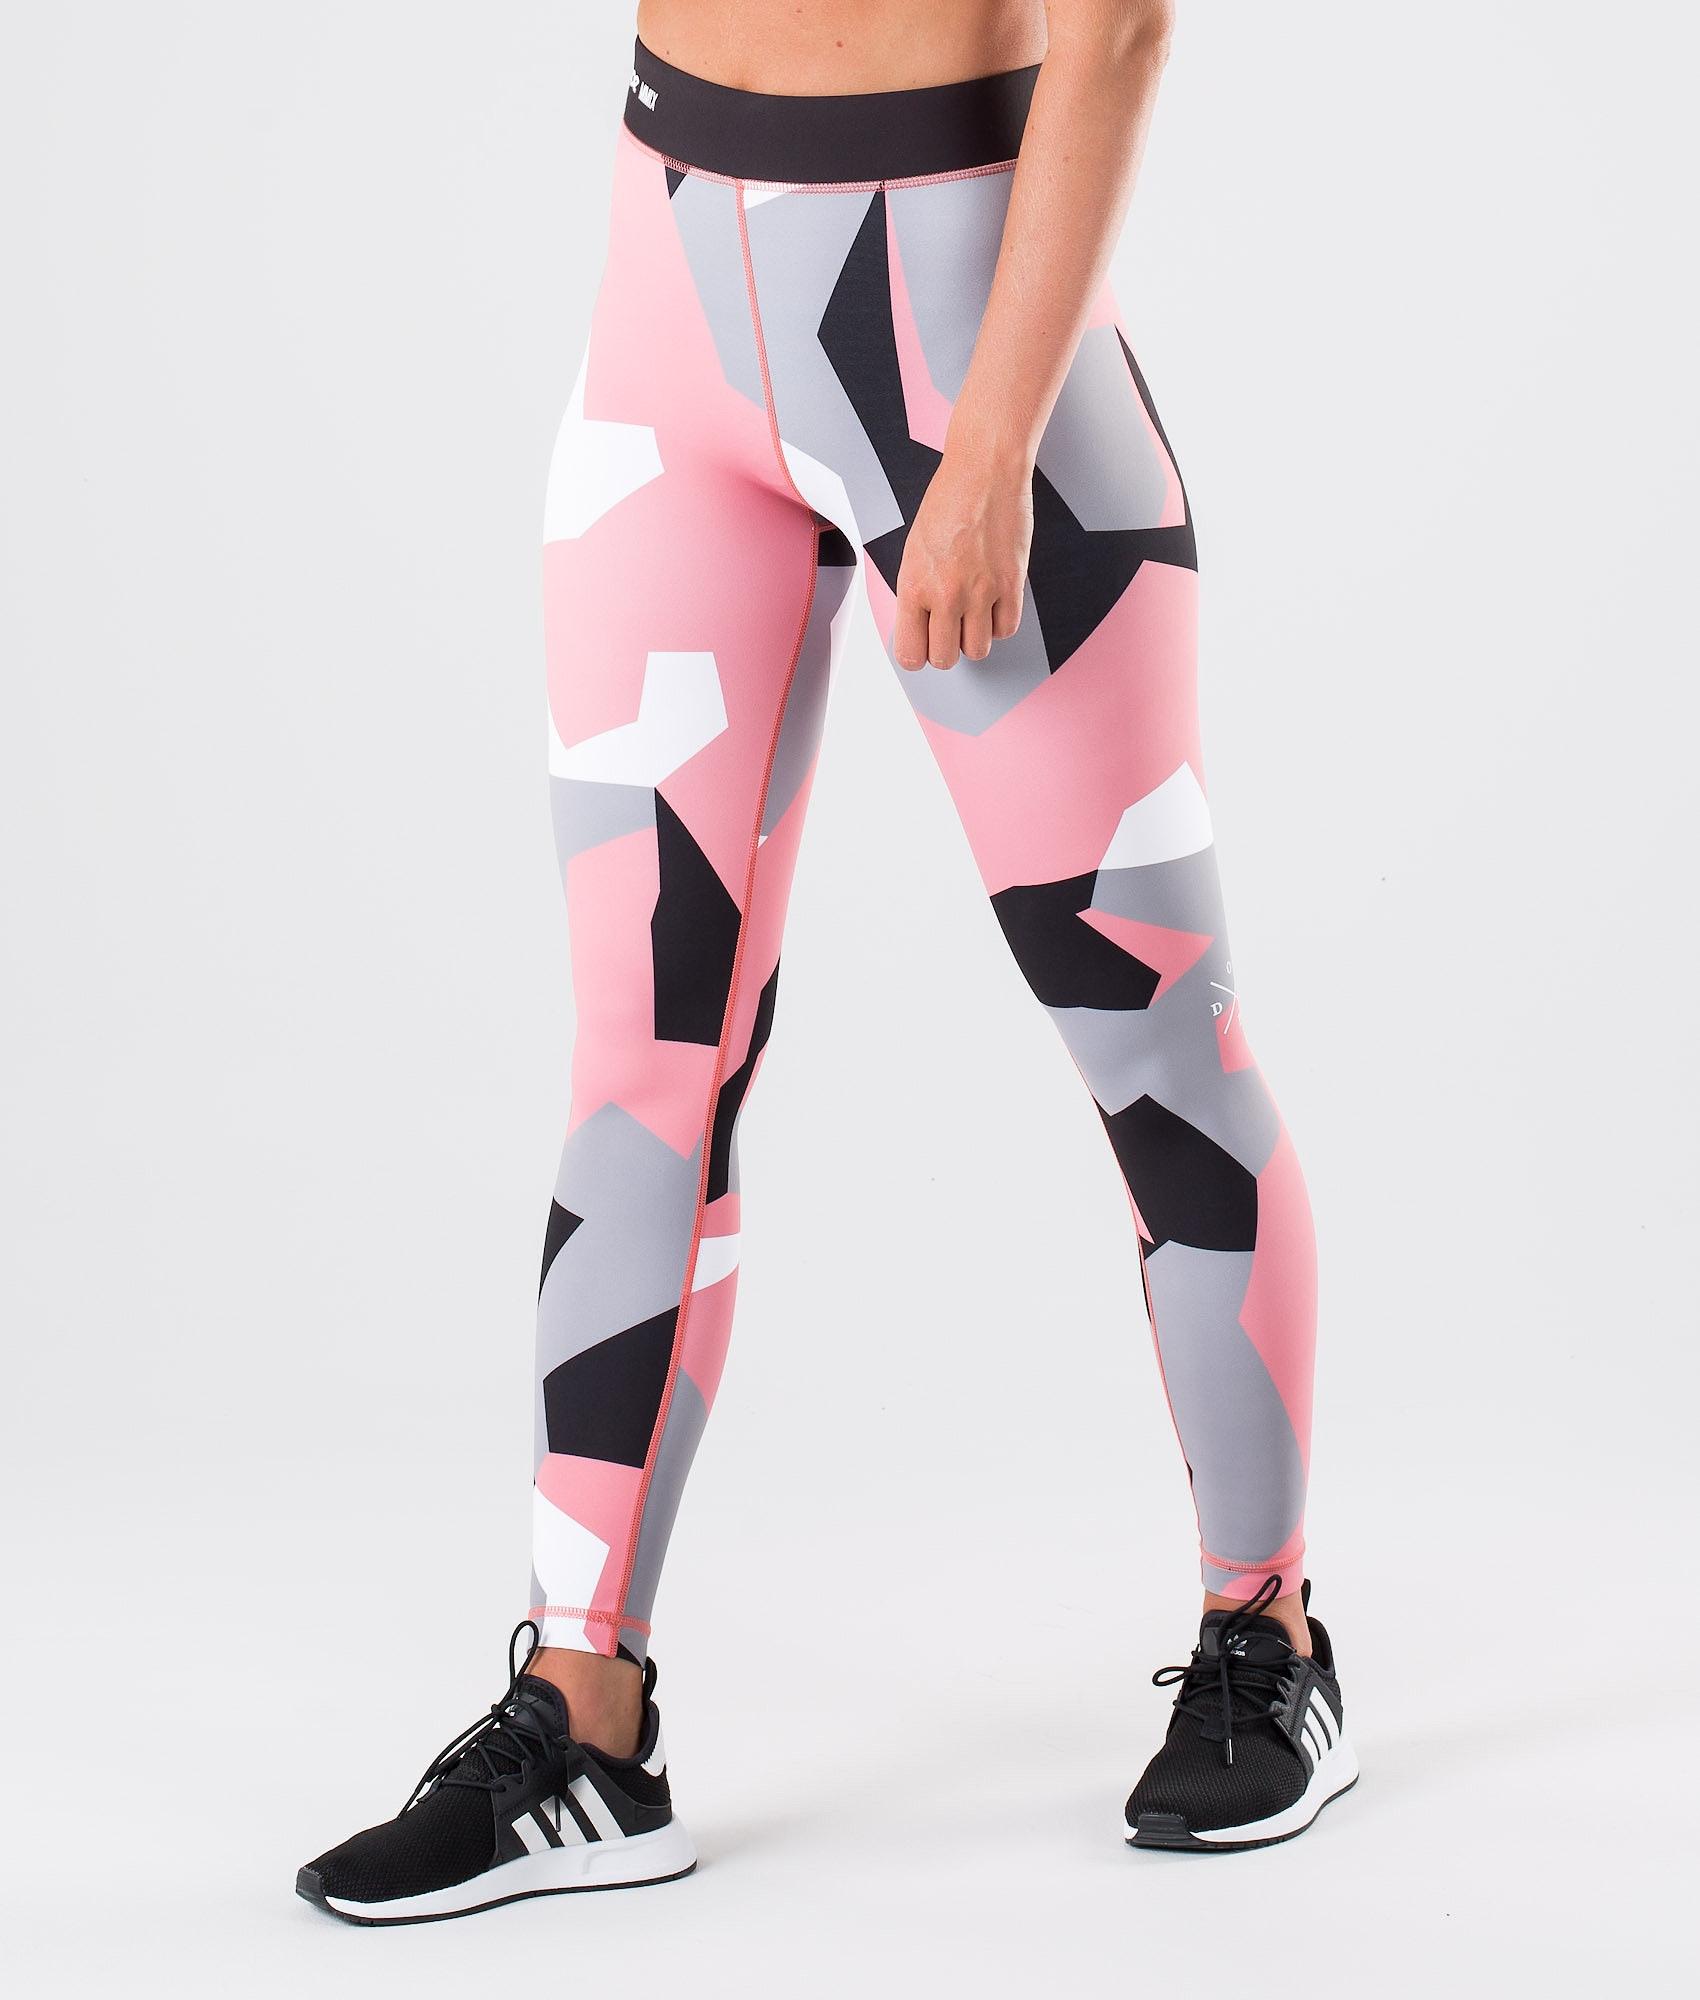 5400b9f8baaae Dope Razor Leggings Pink Camo - Ridestore.com